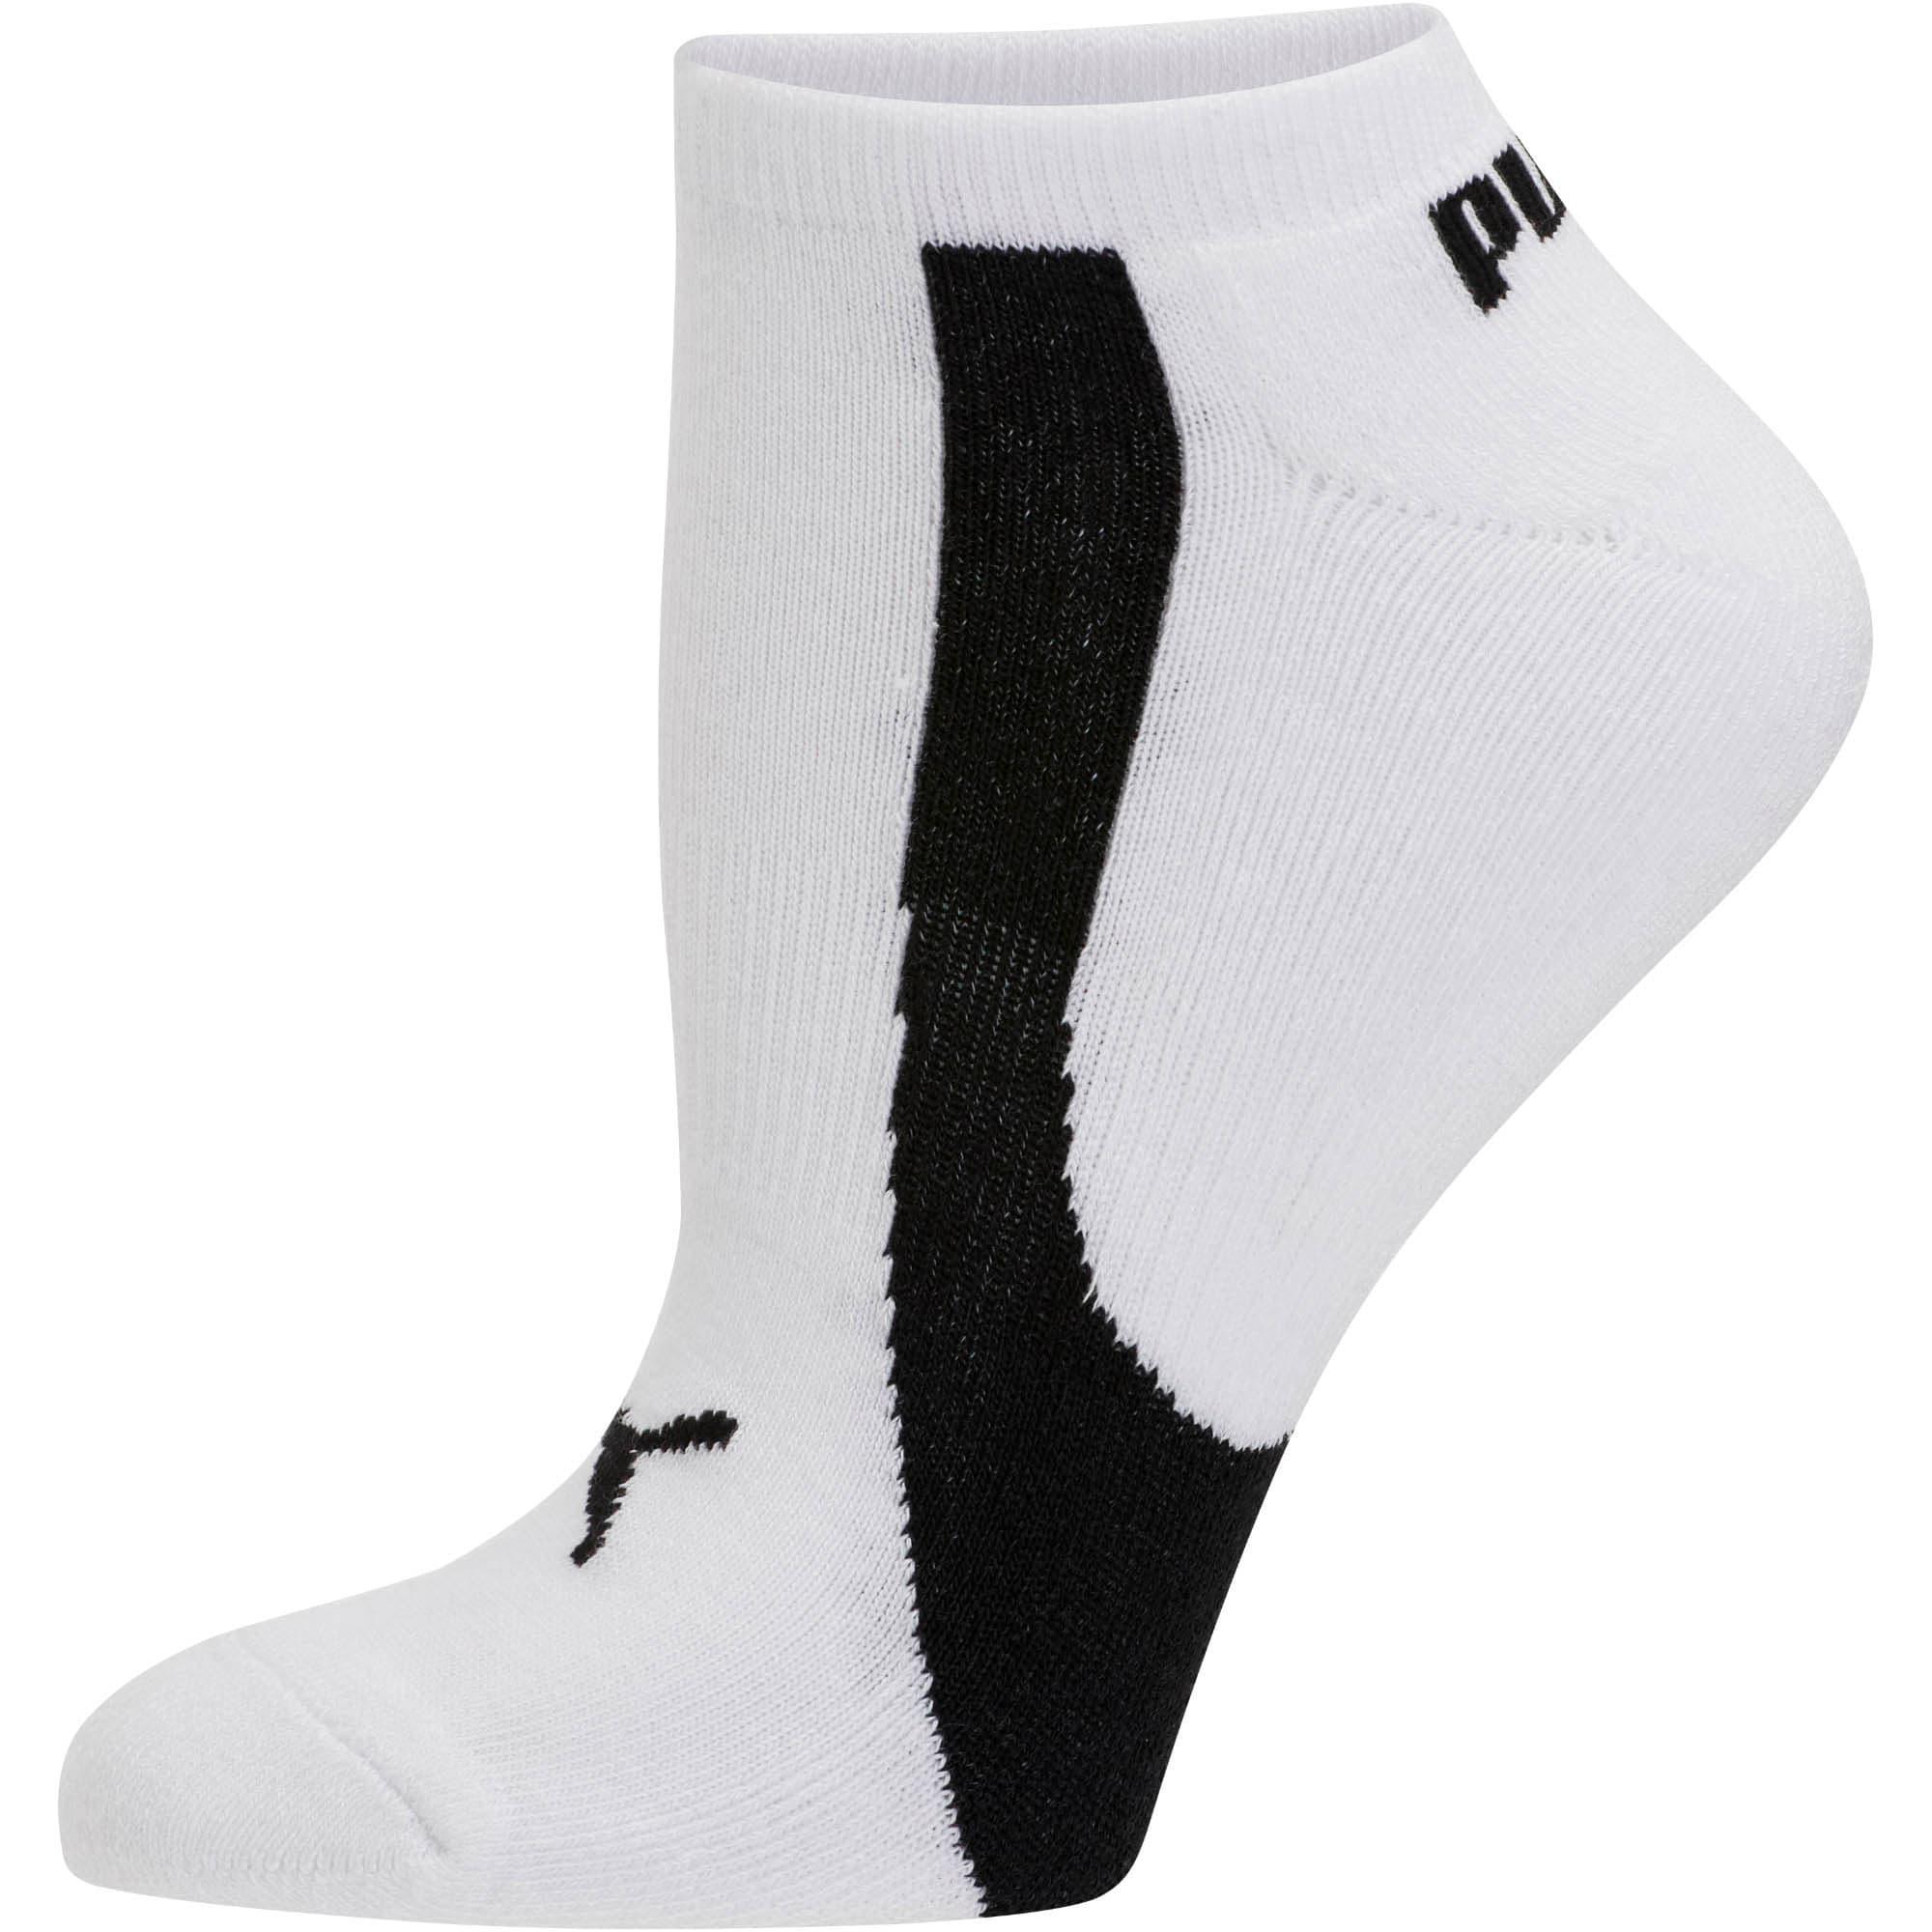 Thumbnail 2 of Women's No Show Socks [3 Pack], white-black, medium